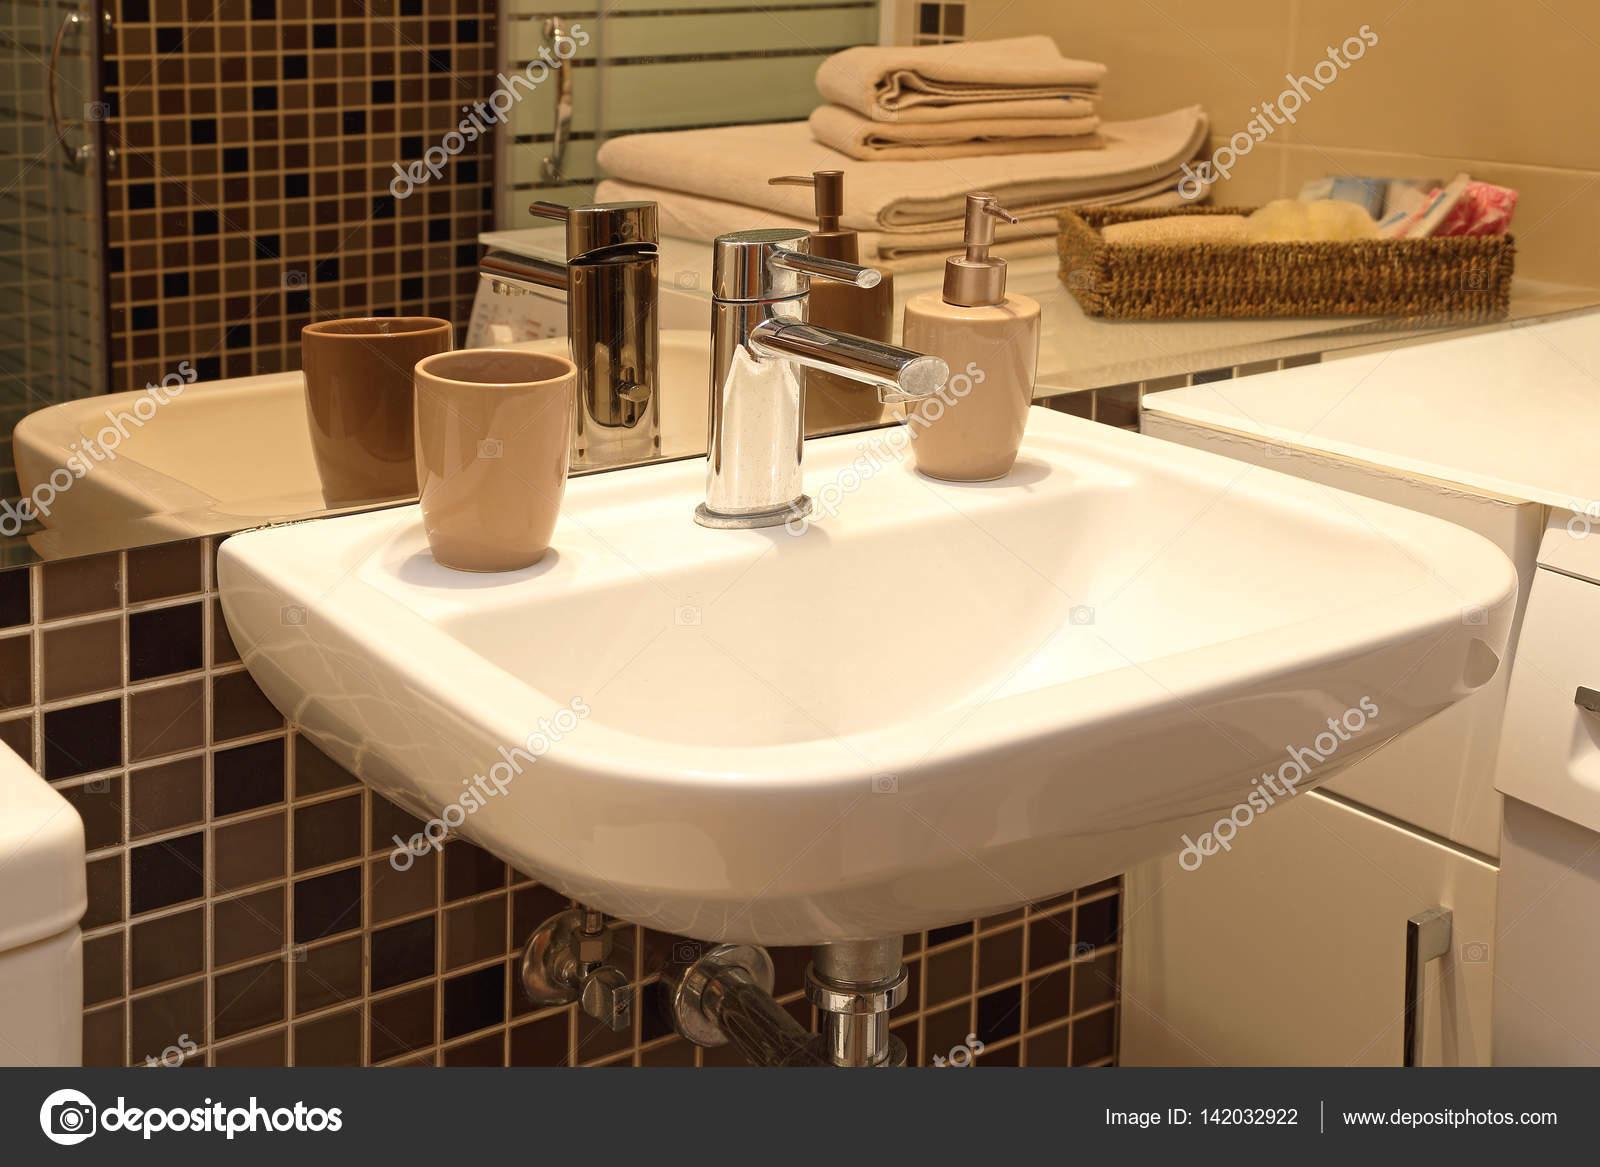 moderne badkamer wastafel — Stockfoto © Baloncici #142032922